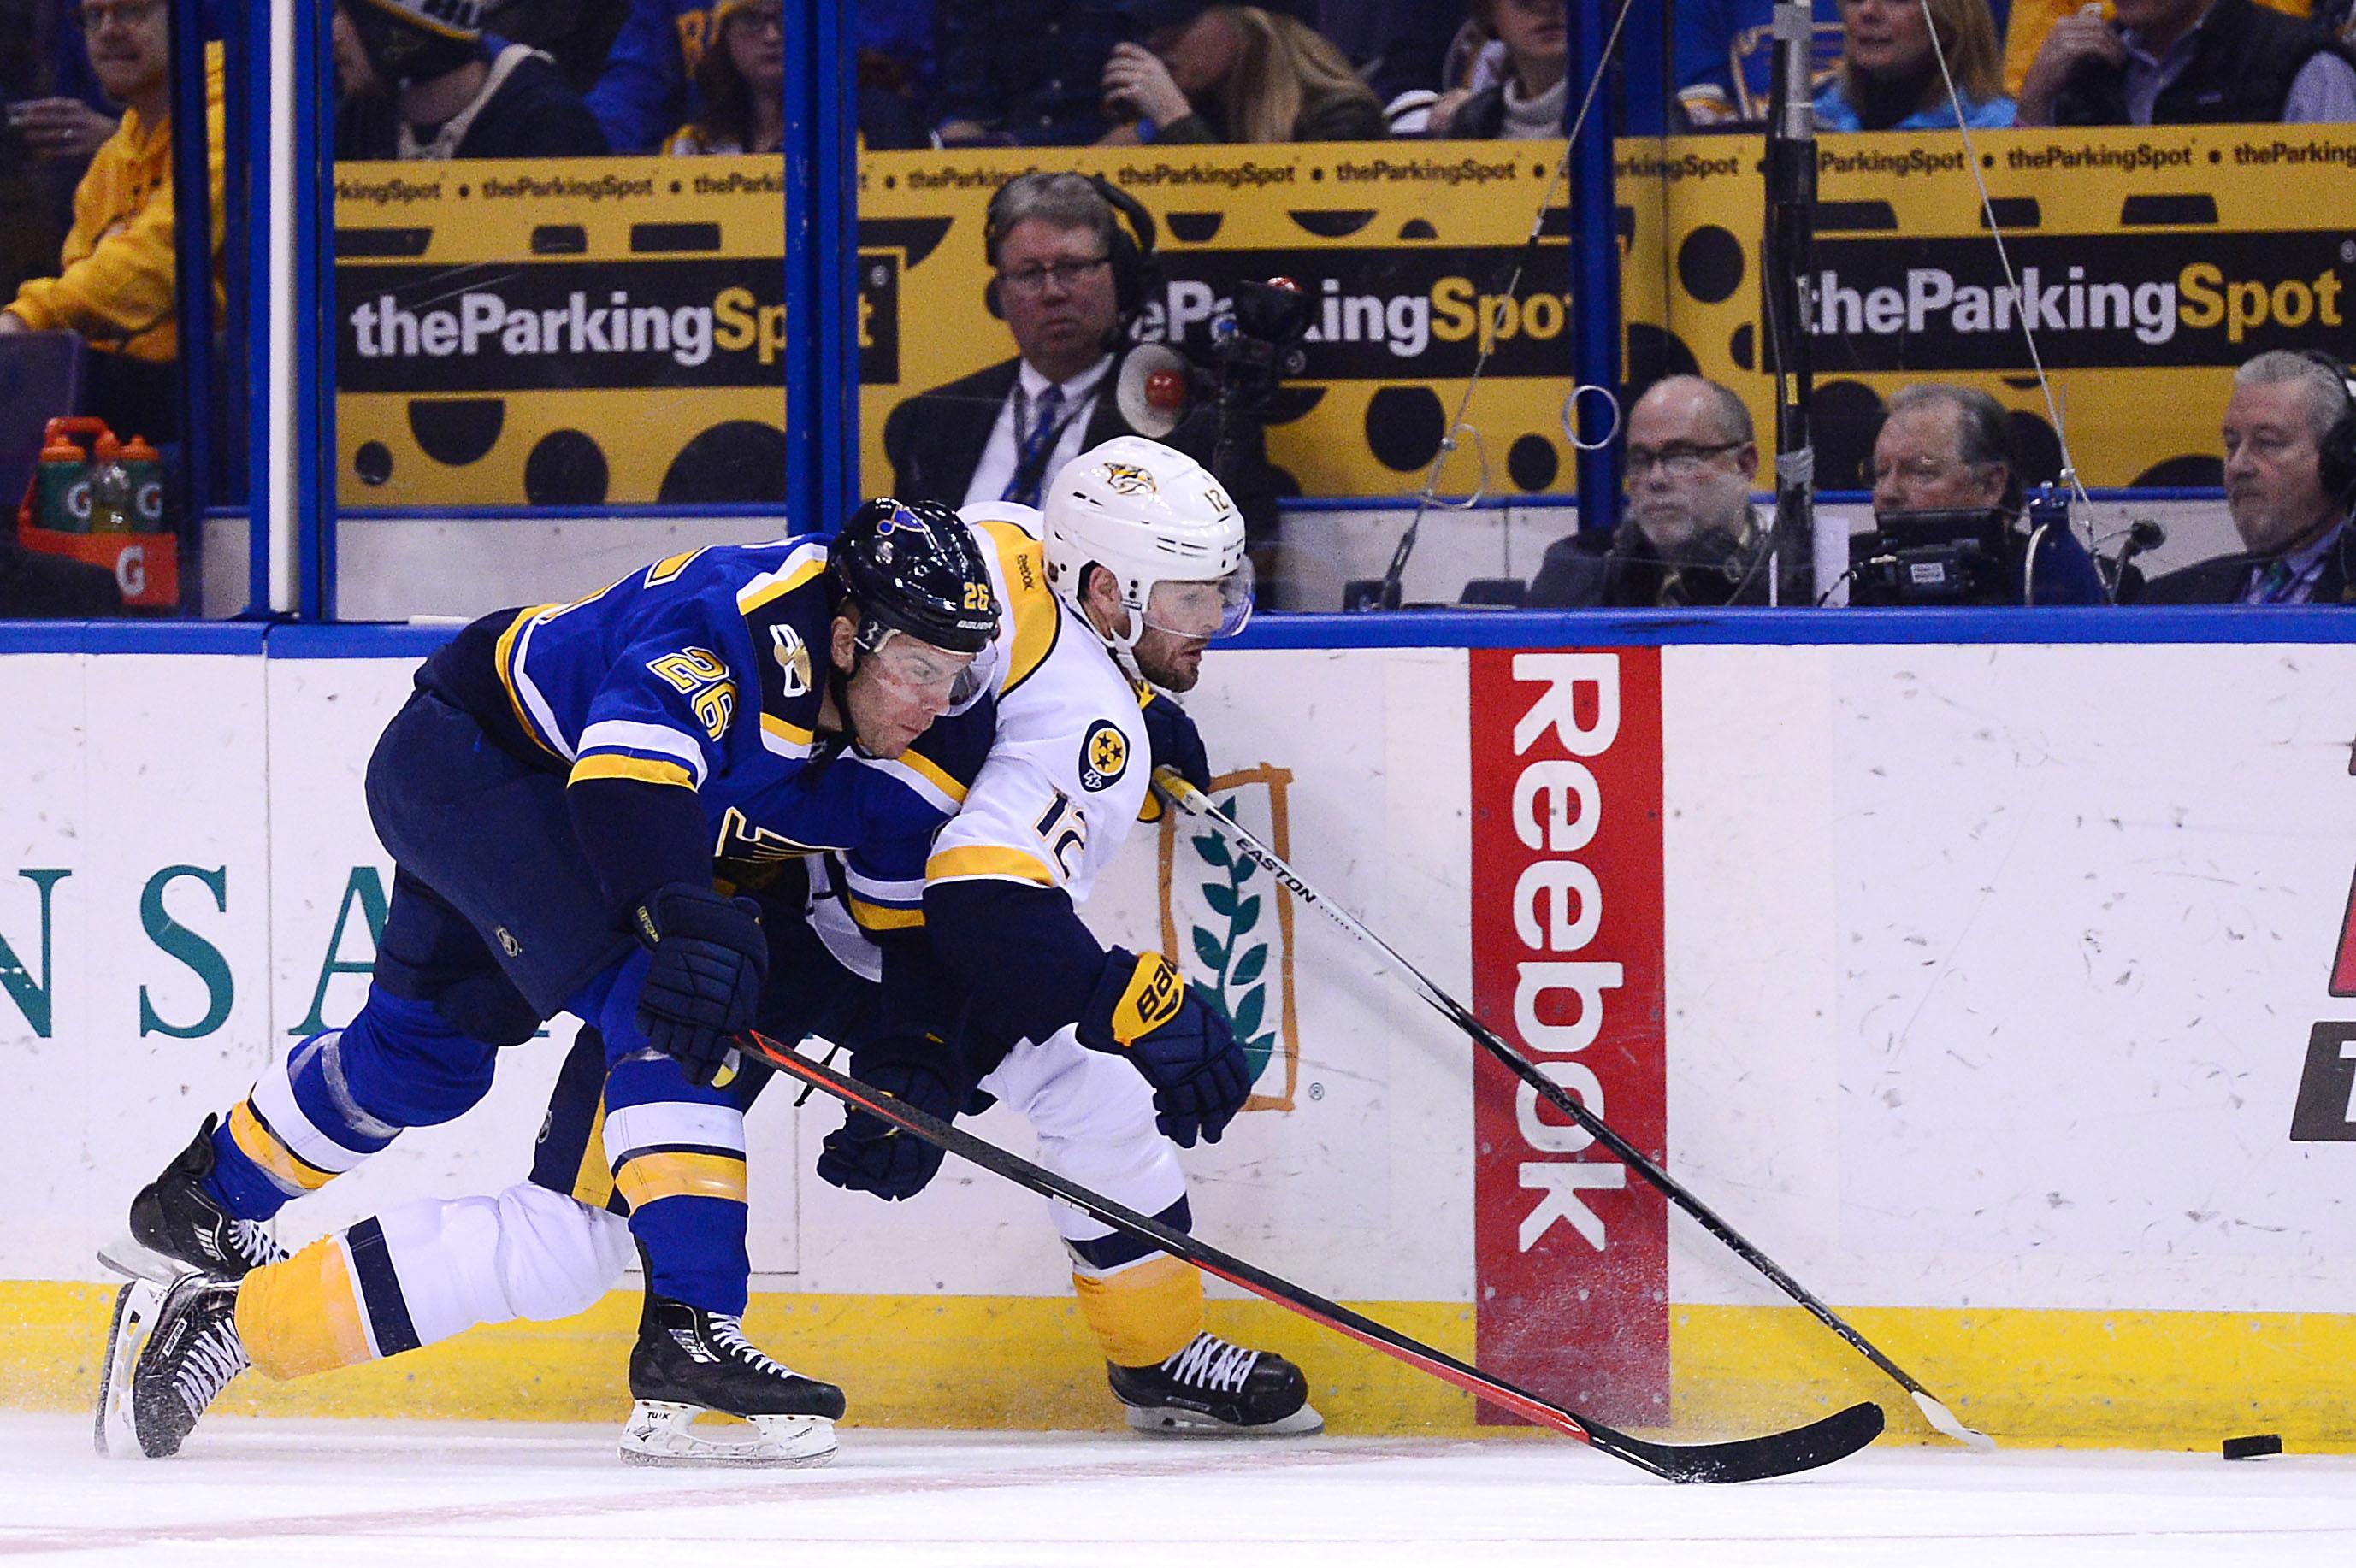 NHL: Nashville Predators vs. St. Louis Blues